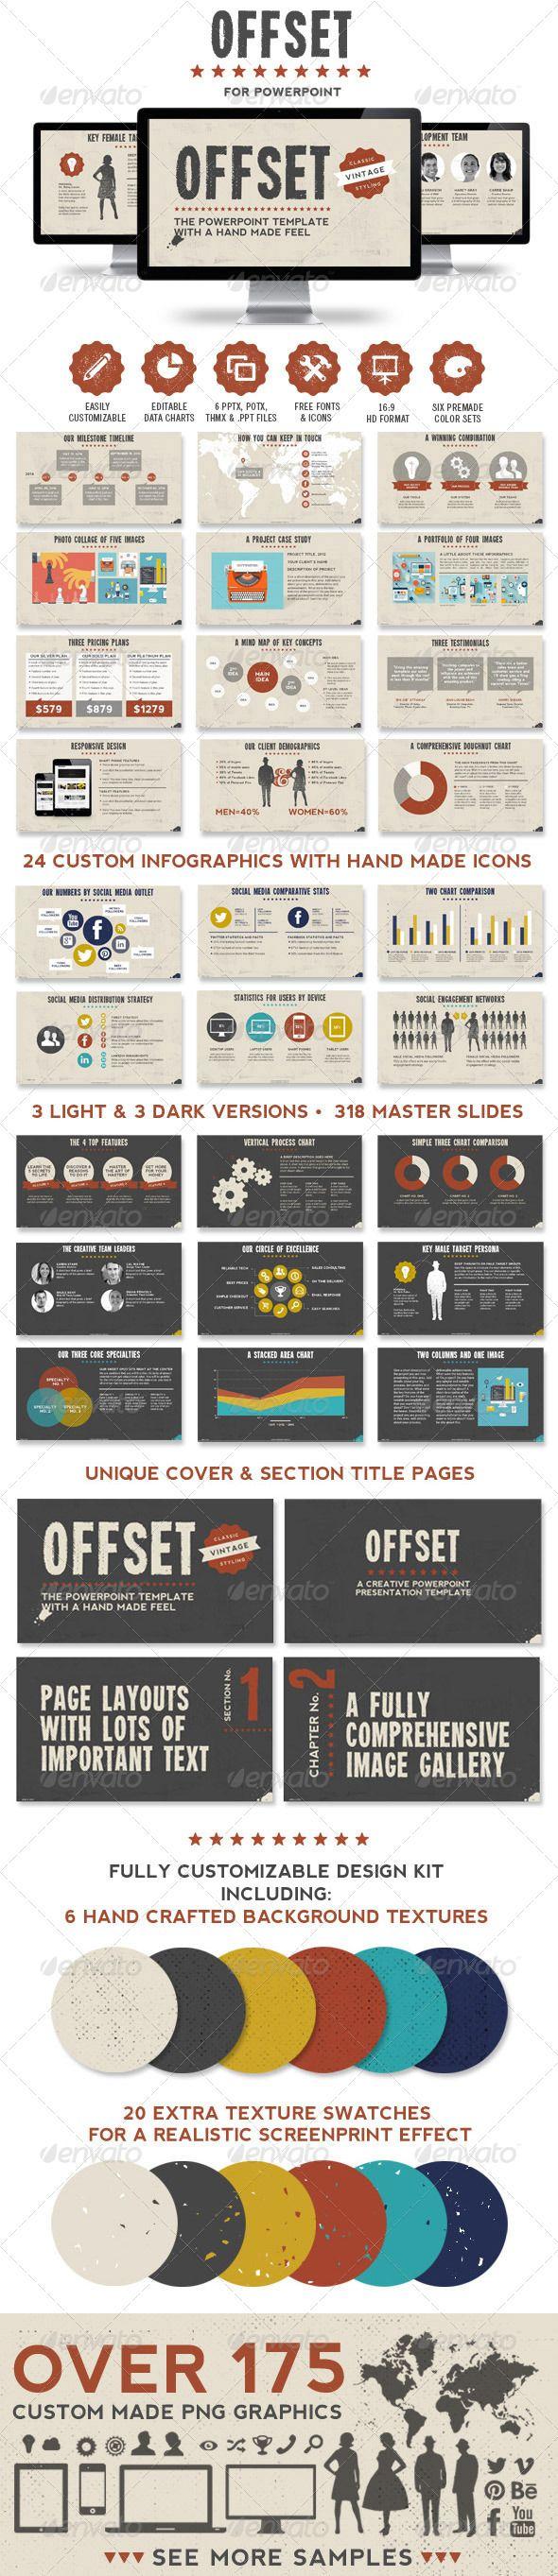 Offset Powerpoint Presentation Template - Creative Powerpoint Templates